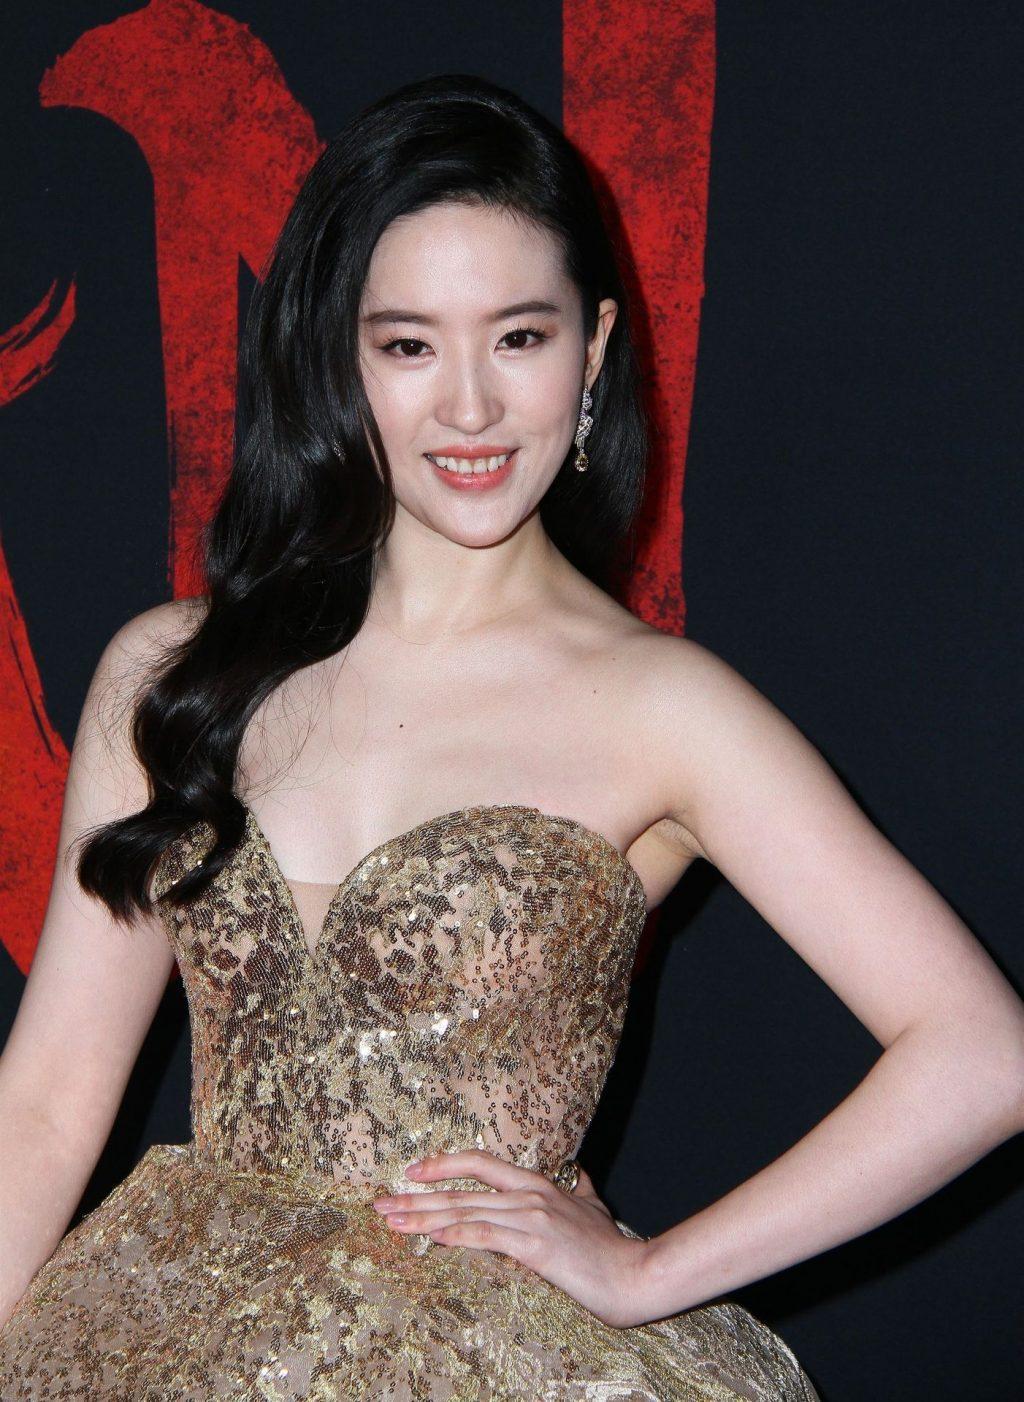 Yifei Liu Nude, Sexy, The Fappening, Uncensored - Photo